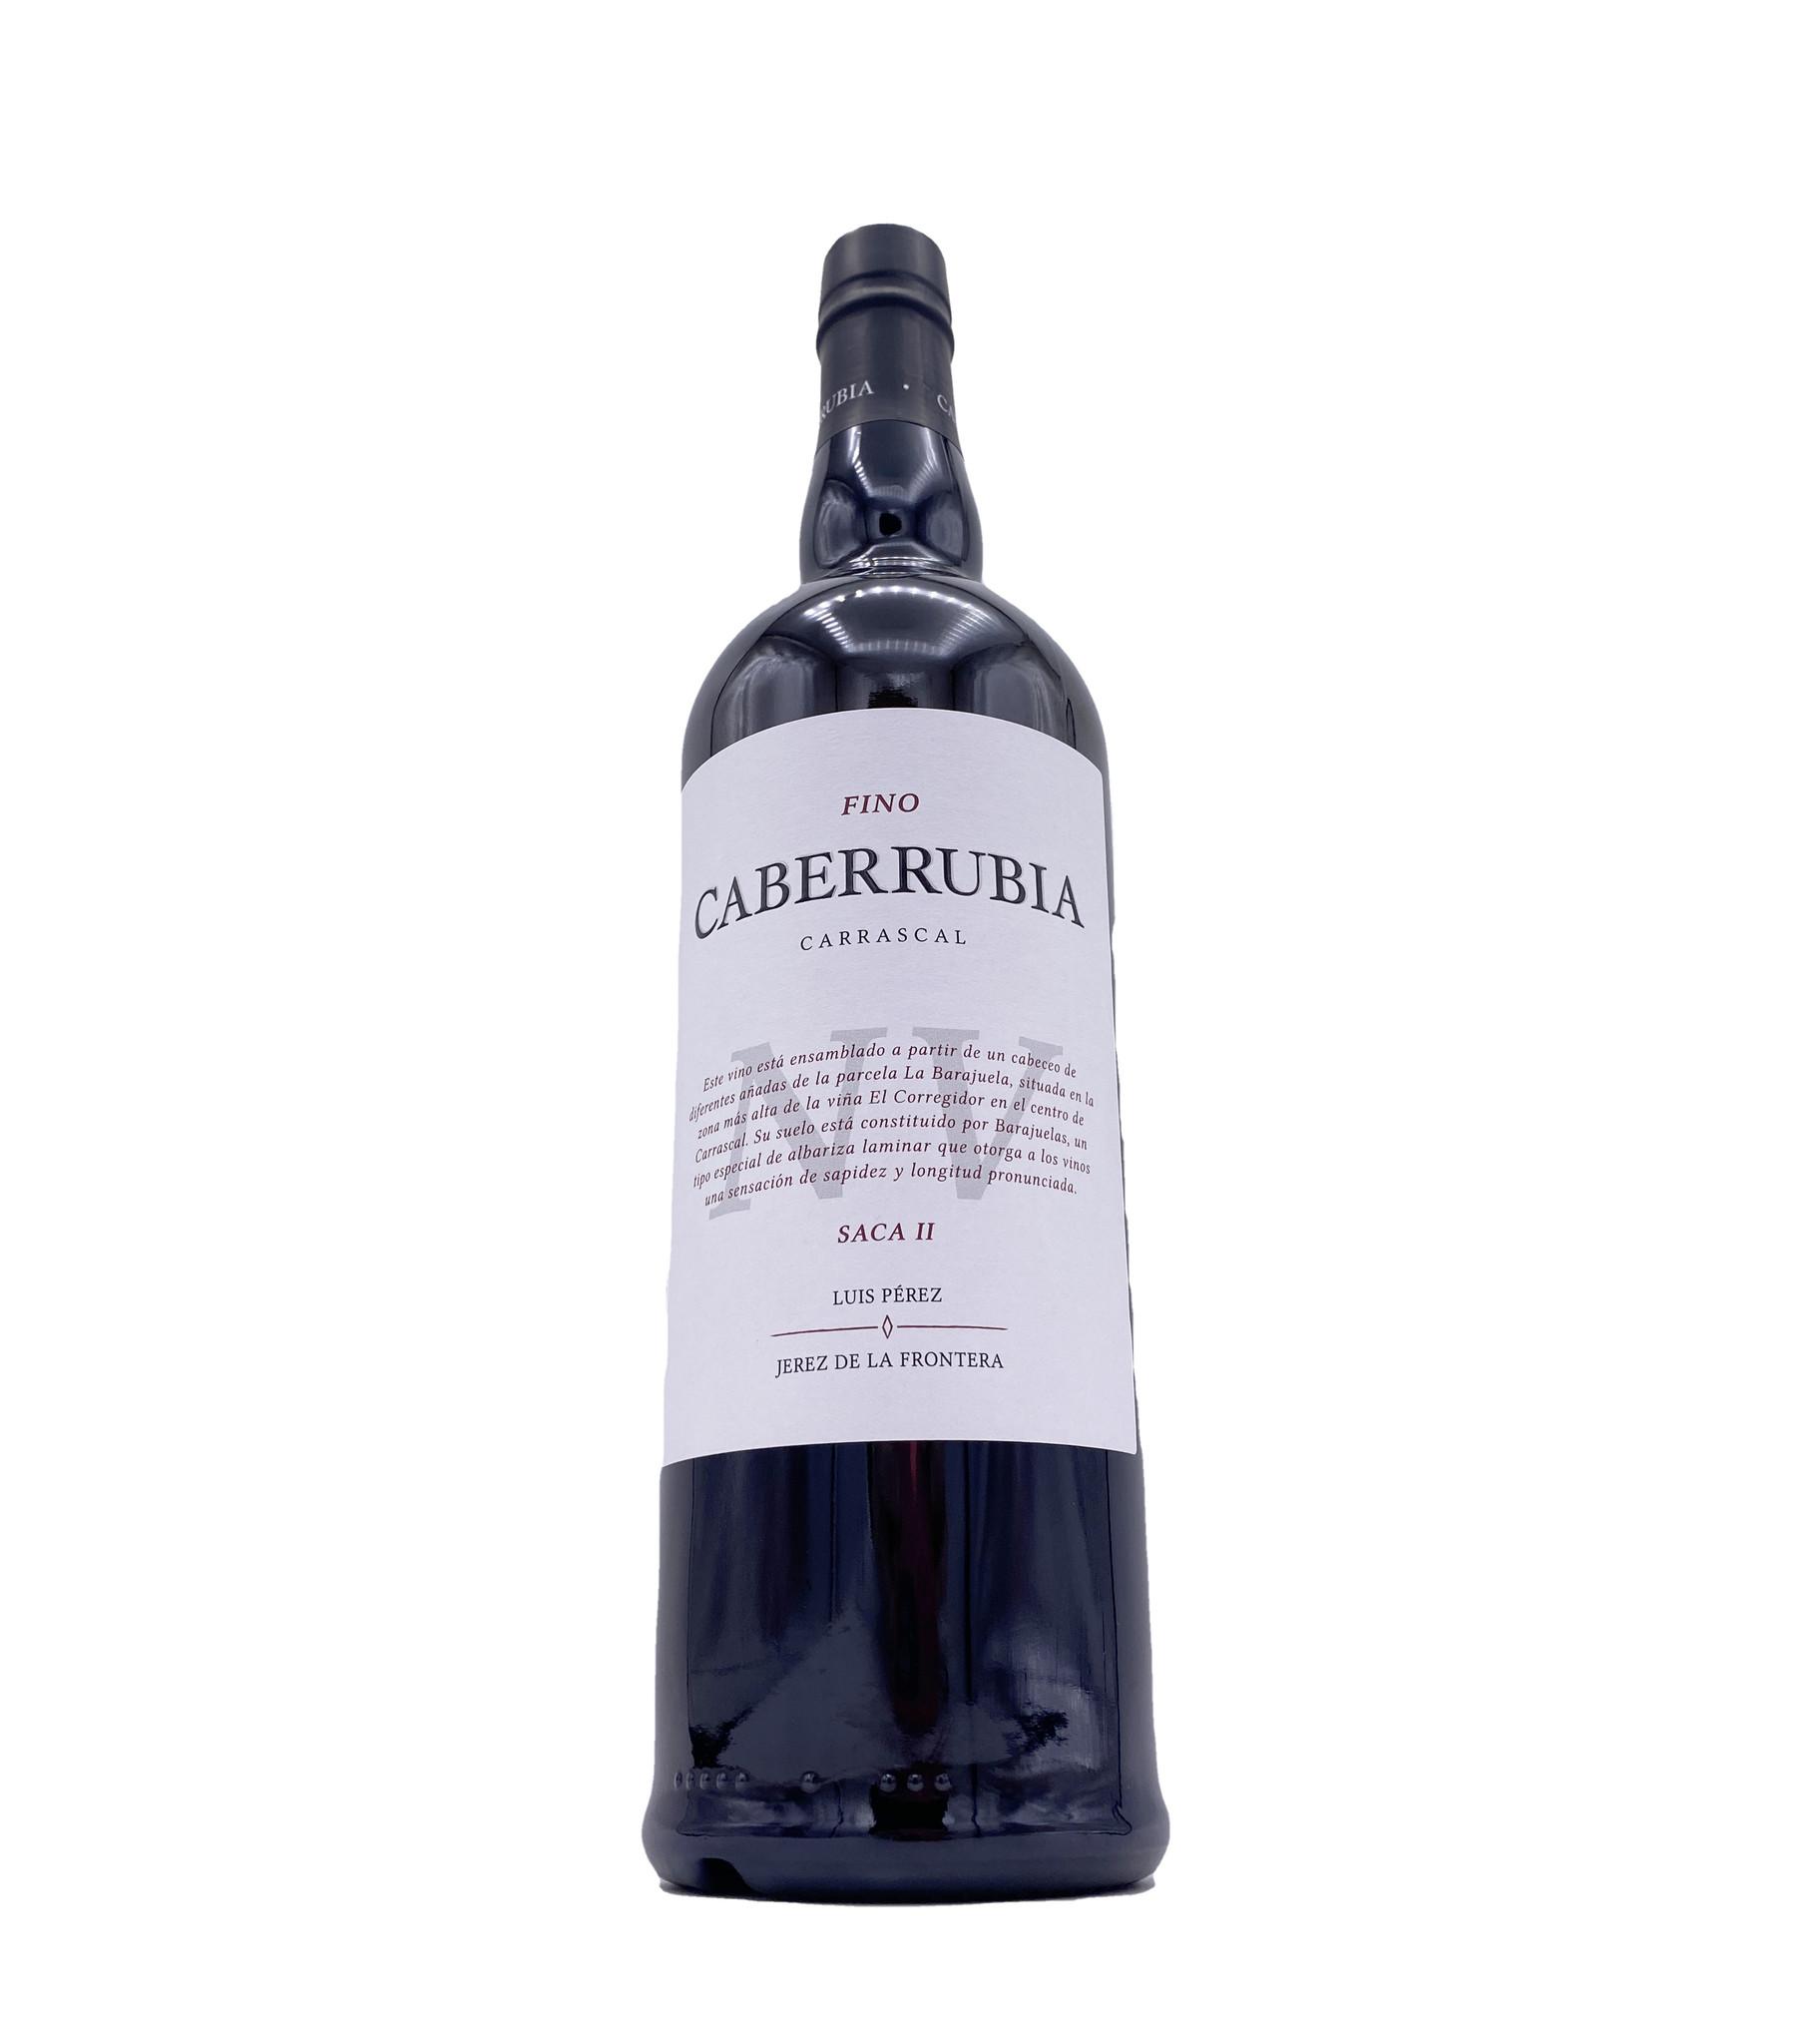 Sherry Fino Caberrubia NV Luis Pèrez